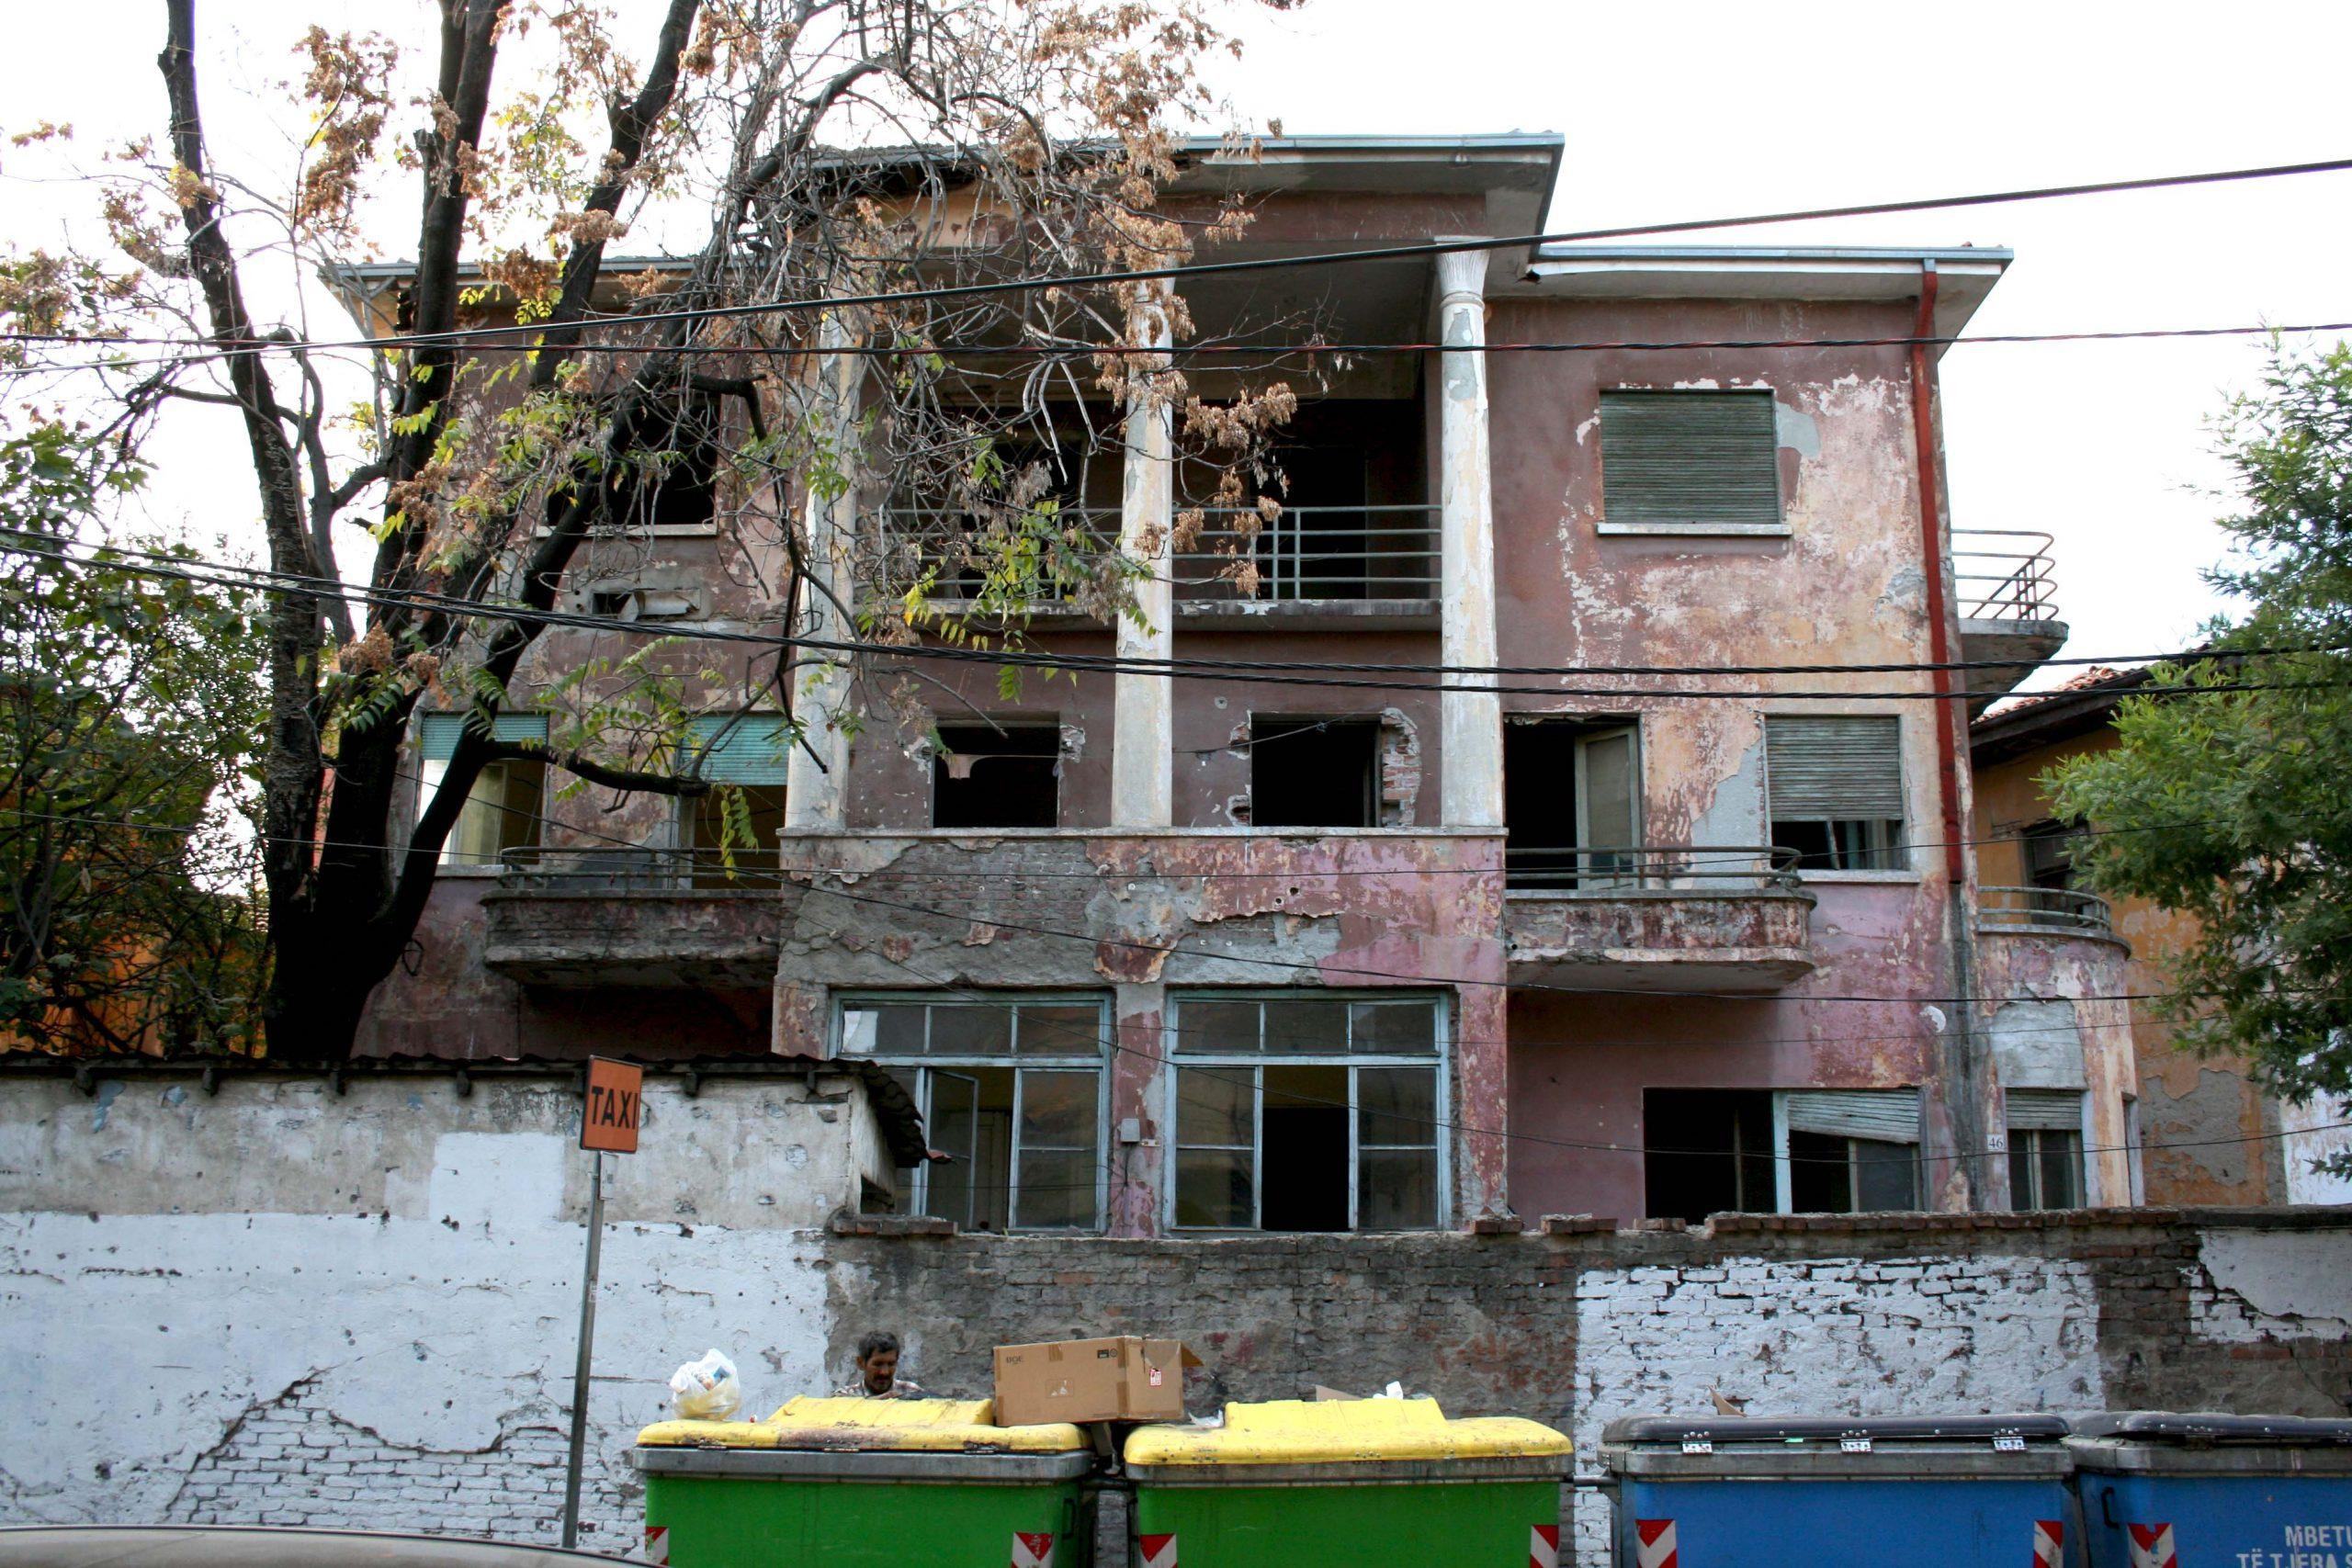 Historic Radio Tirana Building Looks Set to Be Demolished